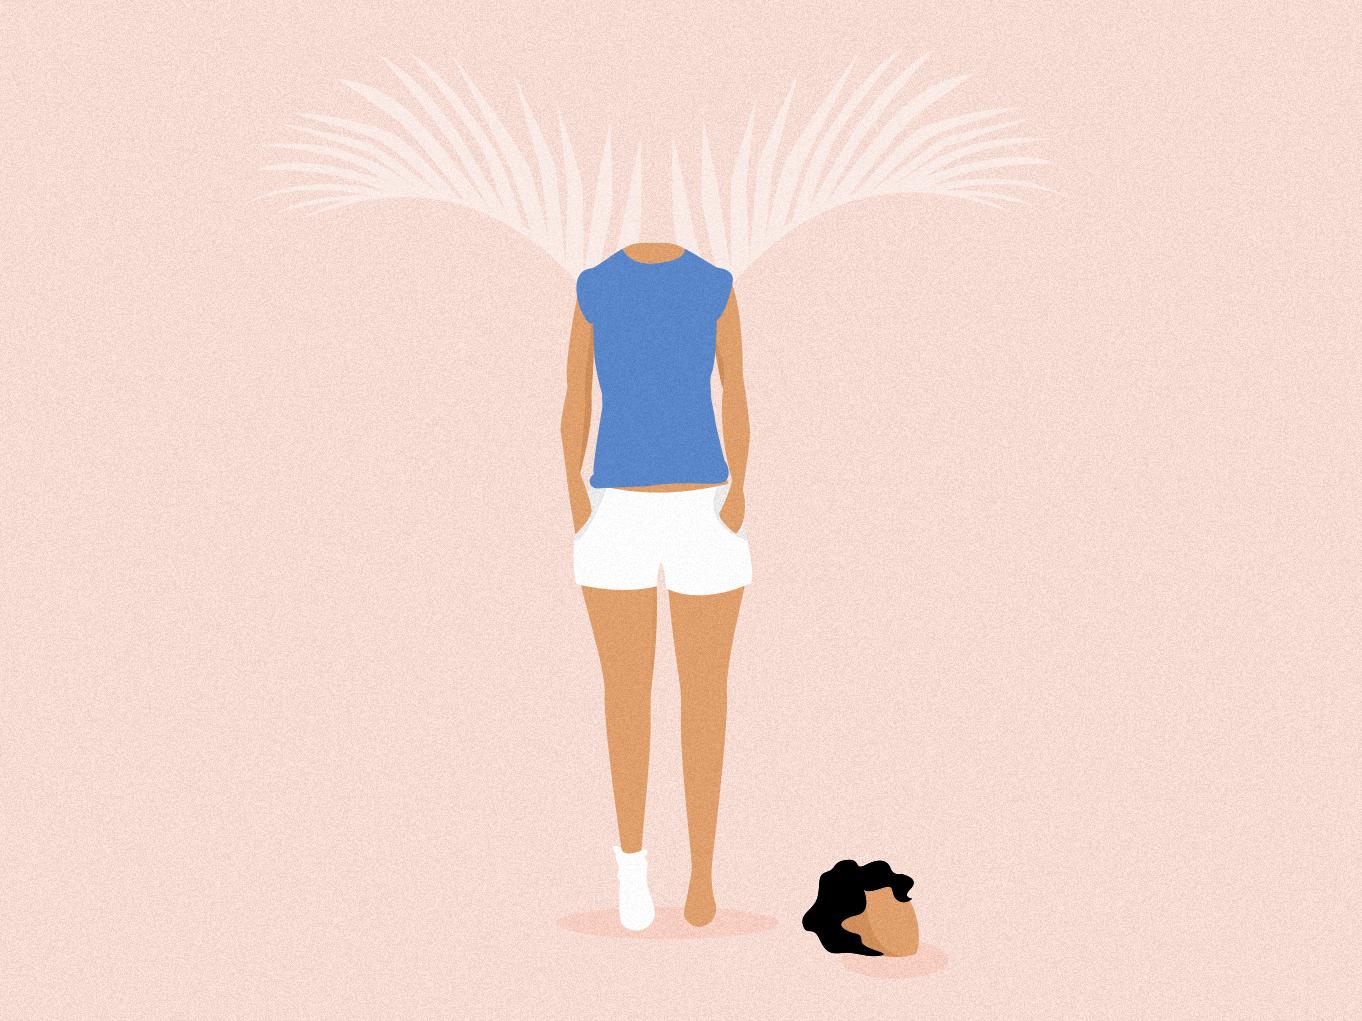 Feelings woman illustration wings artist art graphic design poetry illustration